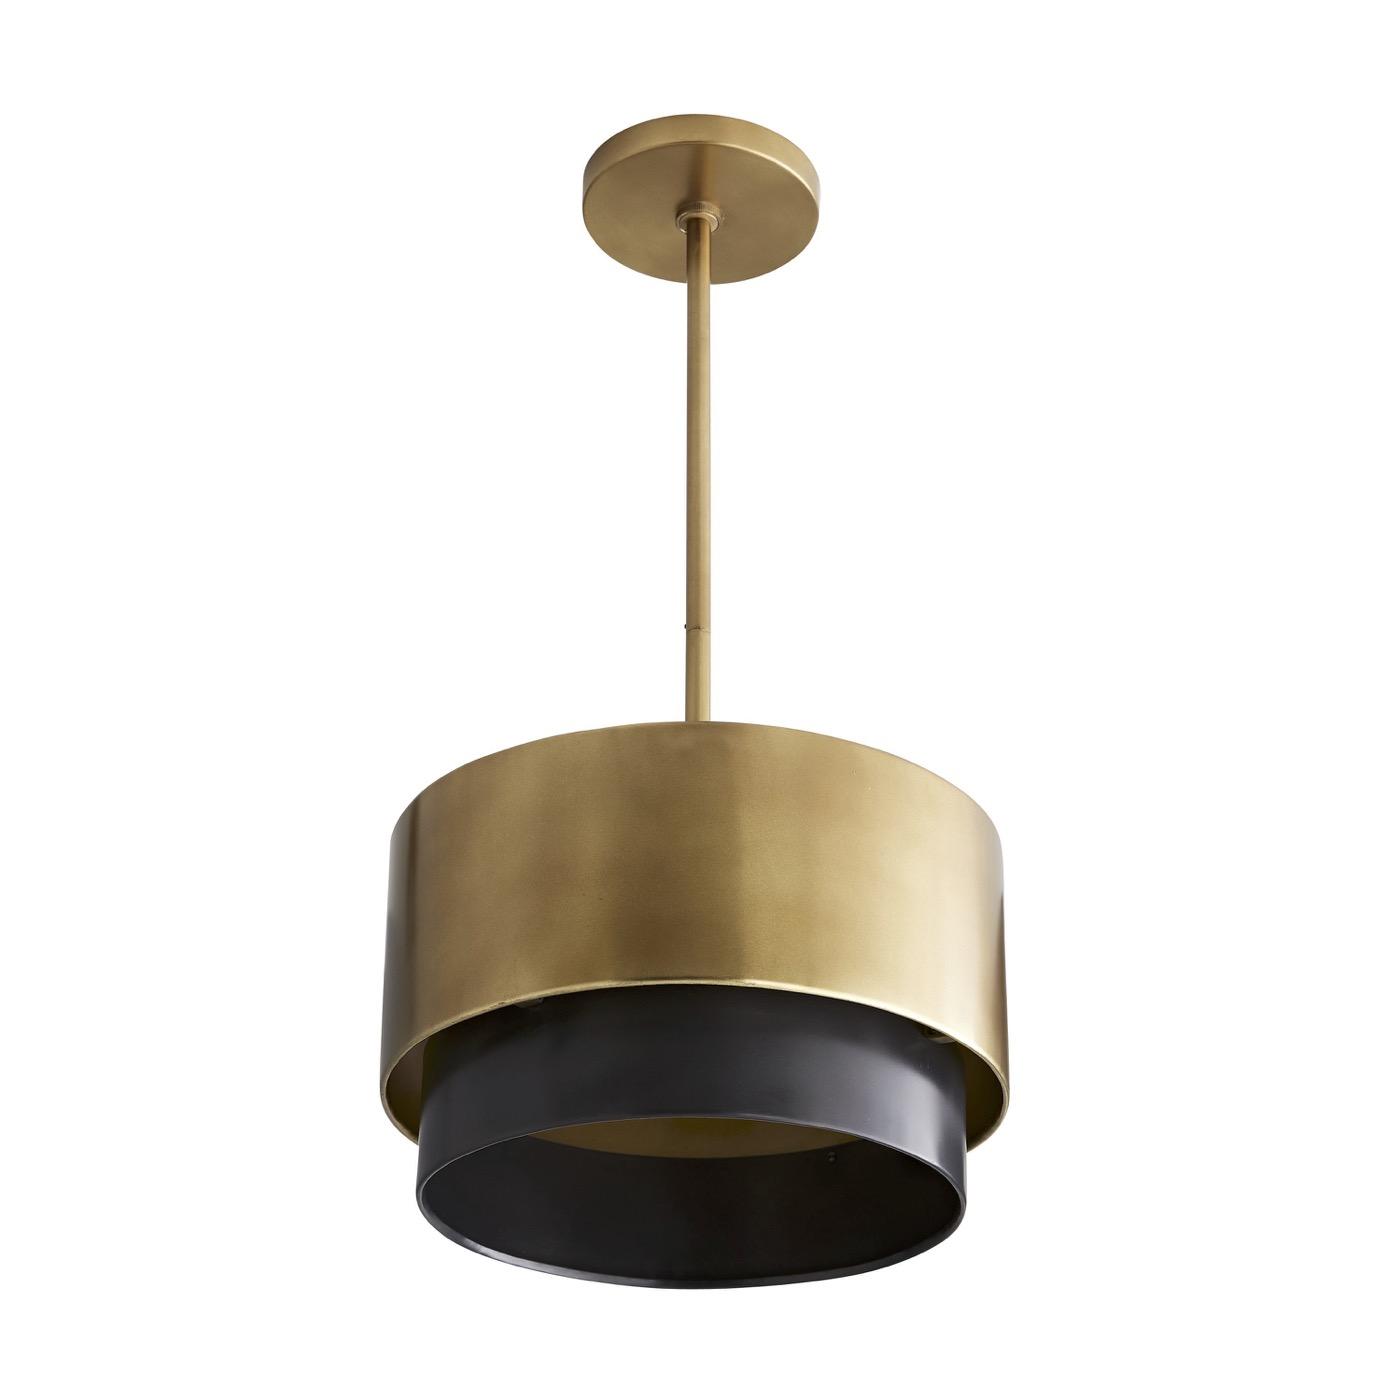 Ripley Petite Pendant | Brass & Bronze